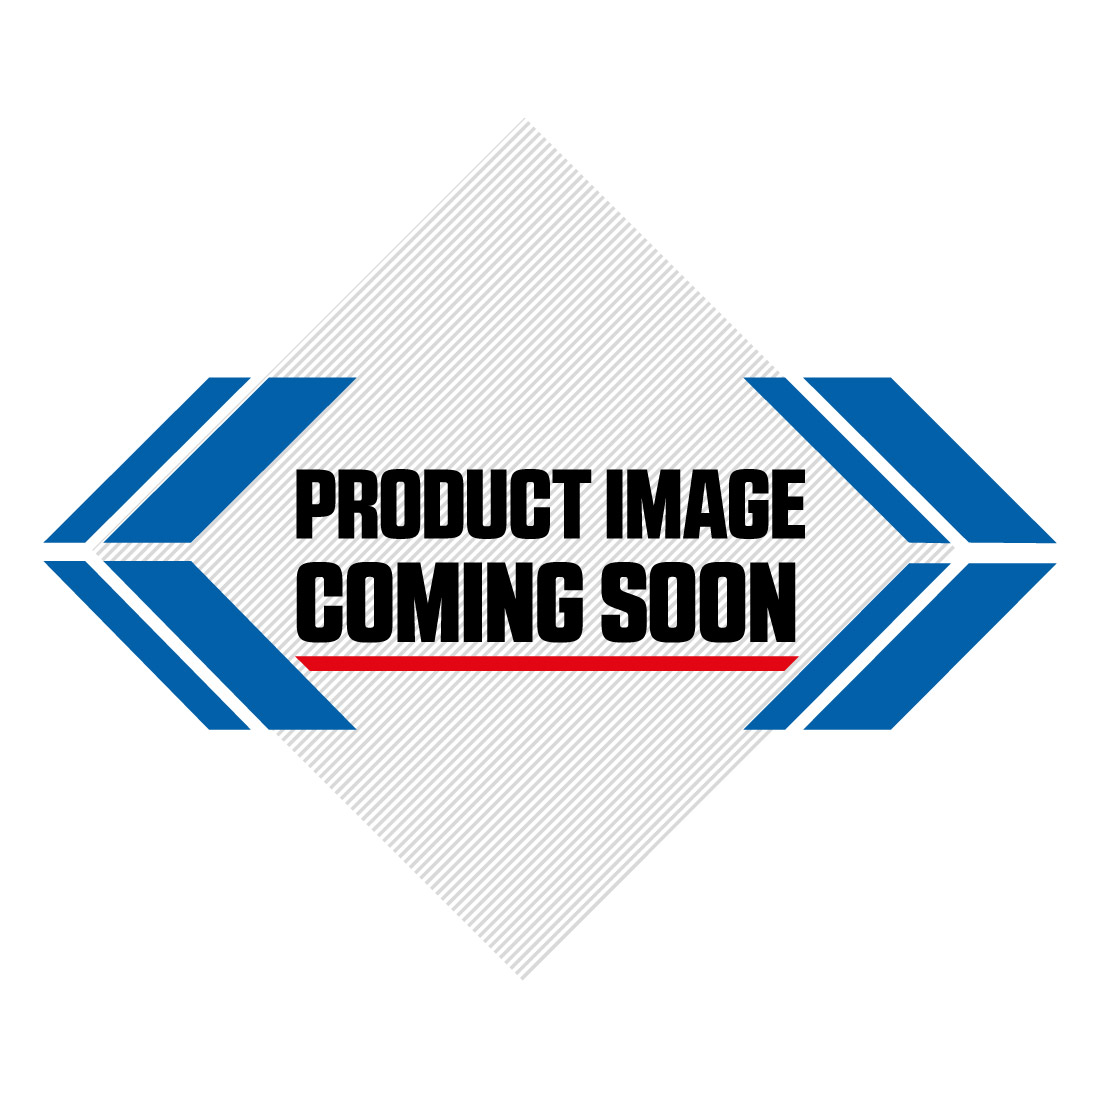 UFO Honda Radiator louvers CRF 250R (18-19) CRF 250RX (2019) OEM Factory Image-2